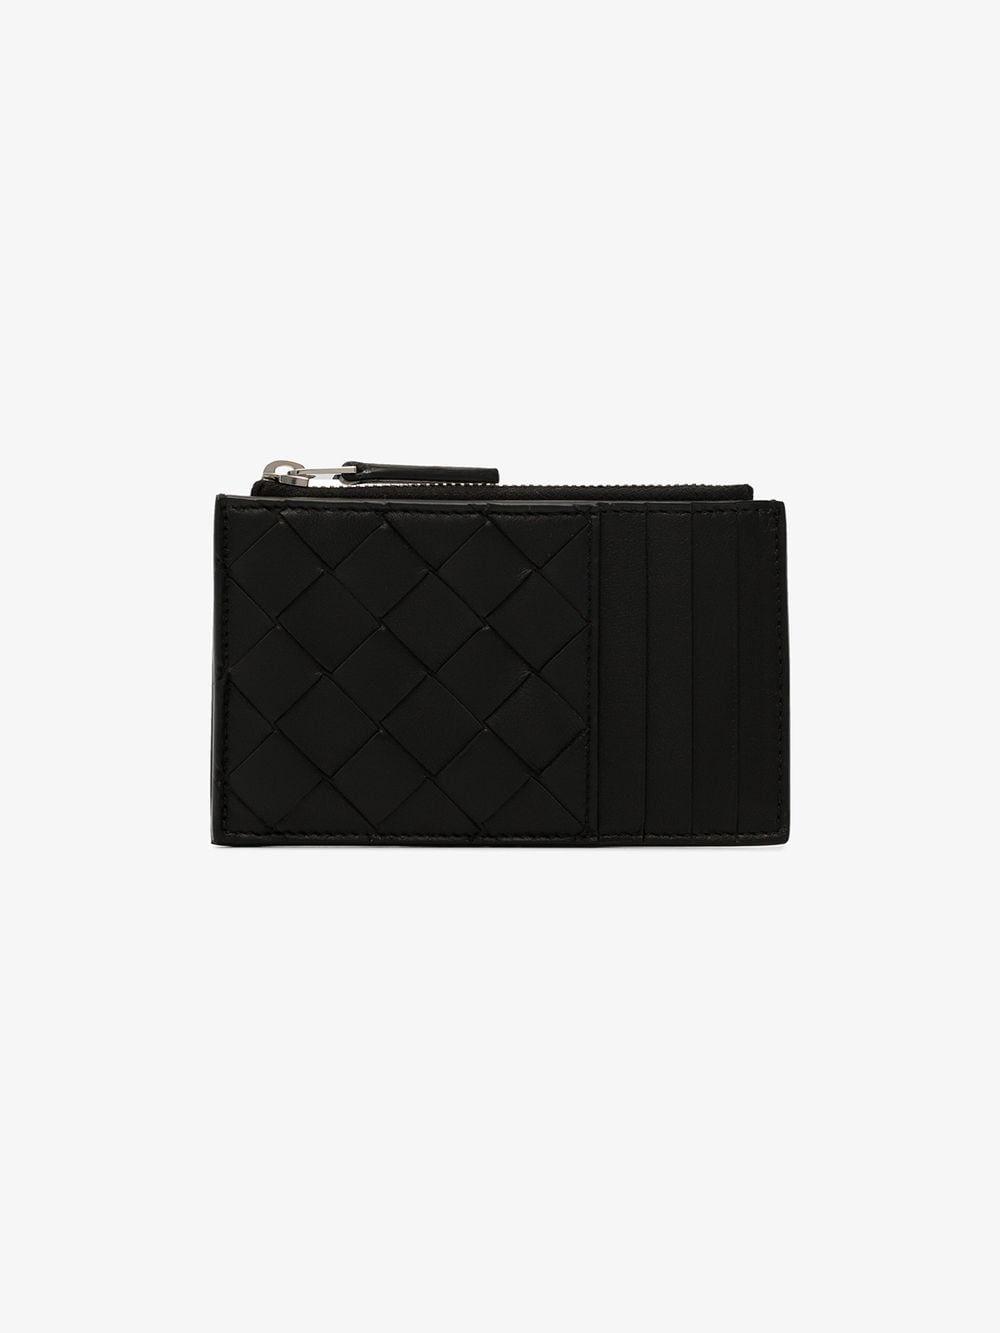 Bottega black woven leather card holder in 2020